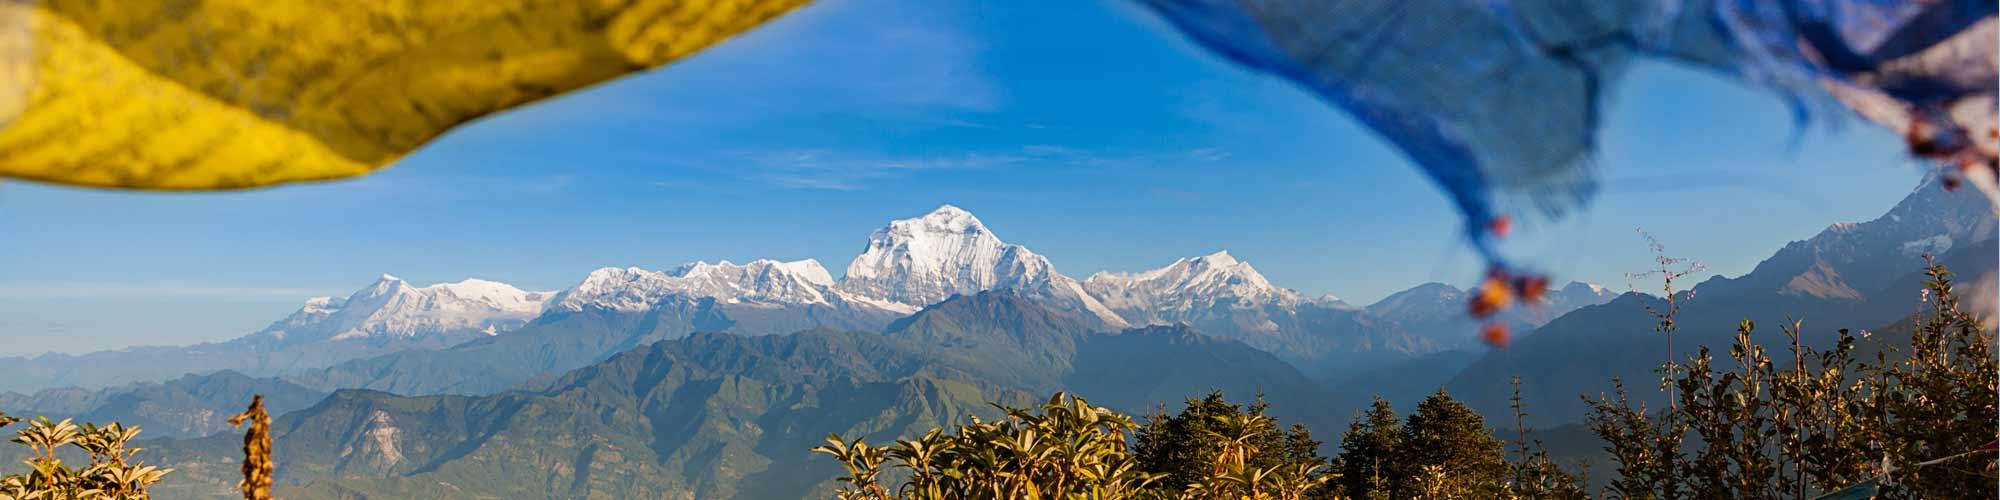 Amanecer en el Annapurna - EL PAIS Viajes